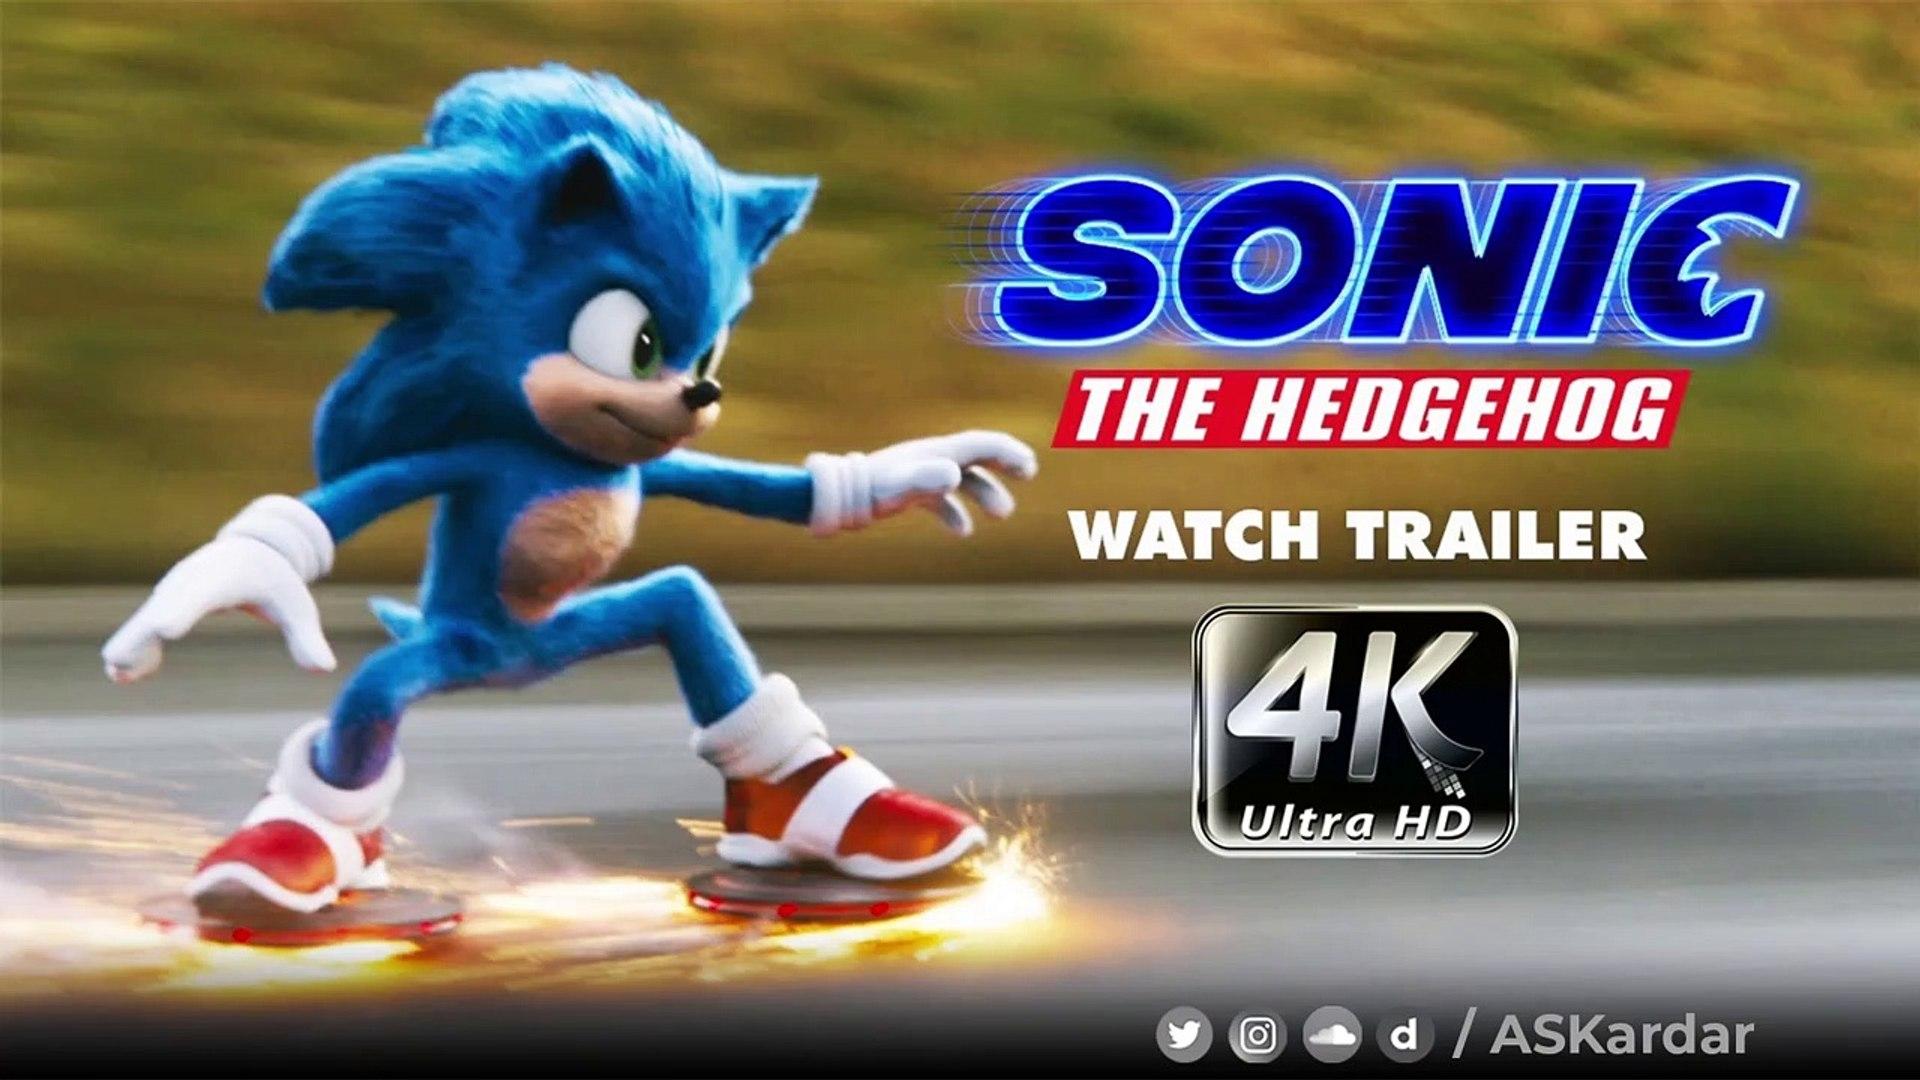 4k Sonic The Hedgehog Official Trailer 2020 Askardar